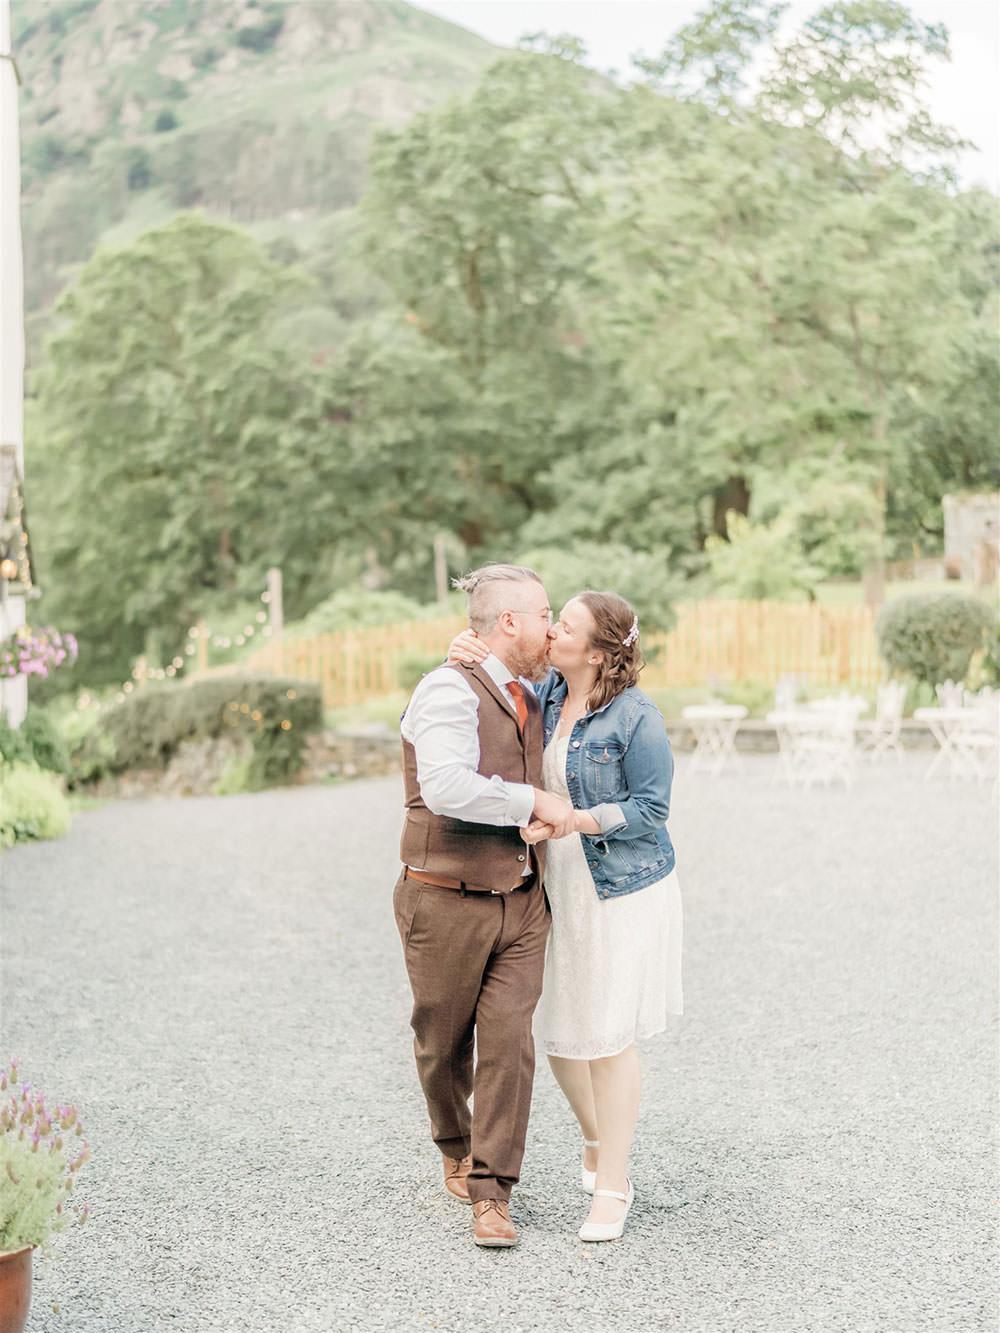 Bride Bridal Long Sleeve Tea Length Dress Lace Slaters Tweed Three Piece Suit Waistcoat Groom Denim Jacket Surprise Wedding Carn Patrick Photography